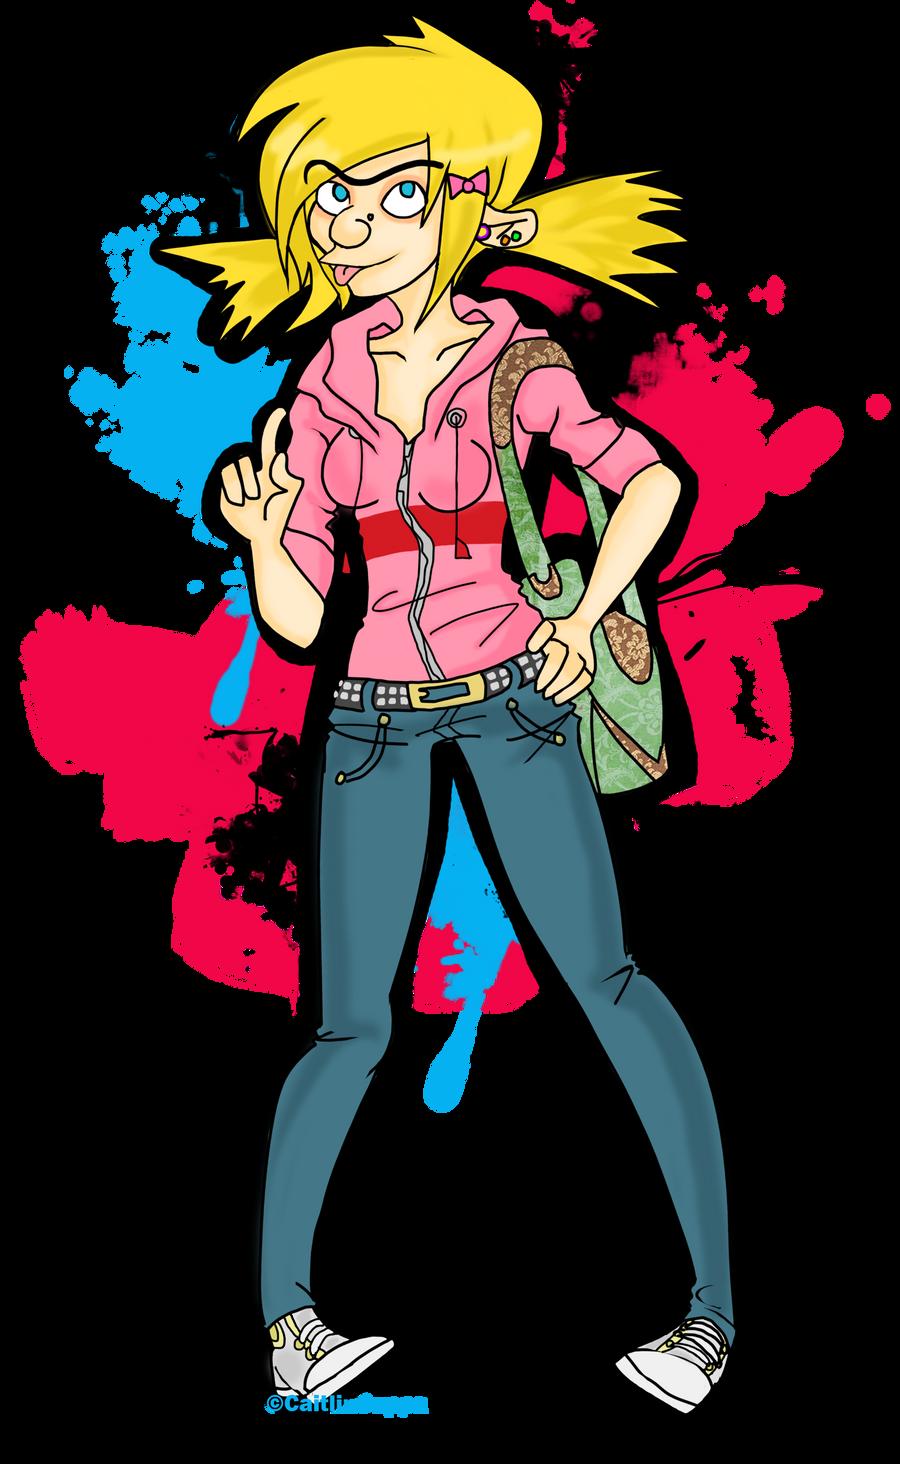 Helga Backe Net Worth